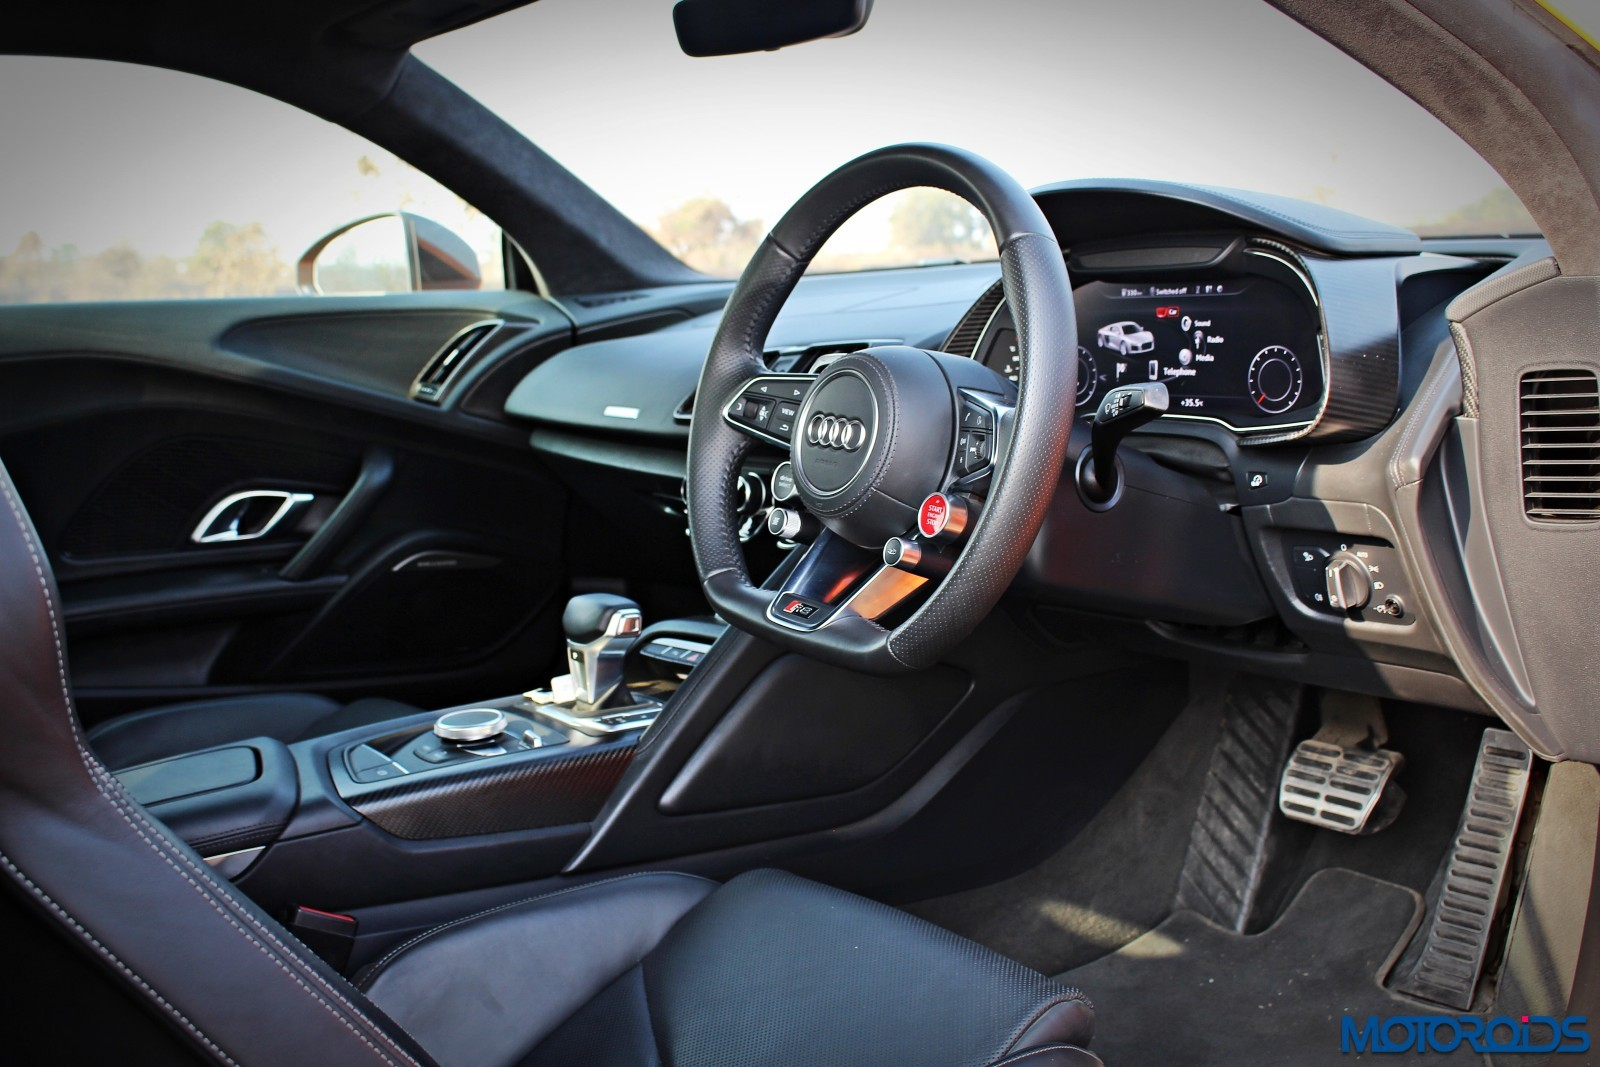 New-Audi-R8-V10-Plus-dashboard-1